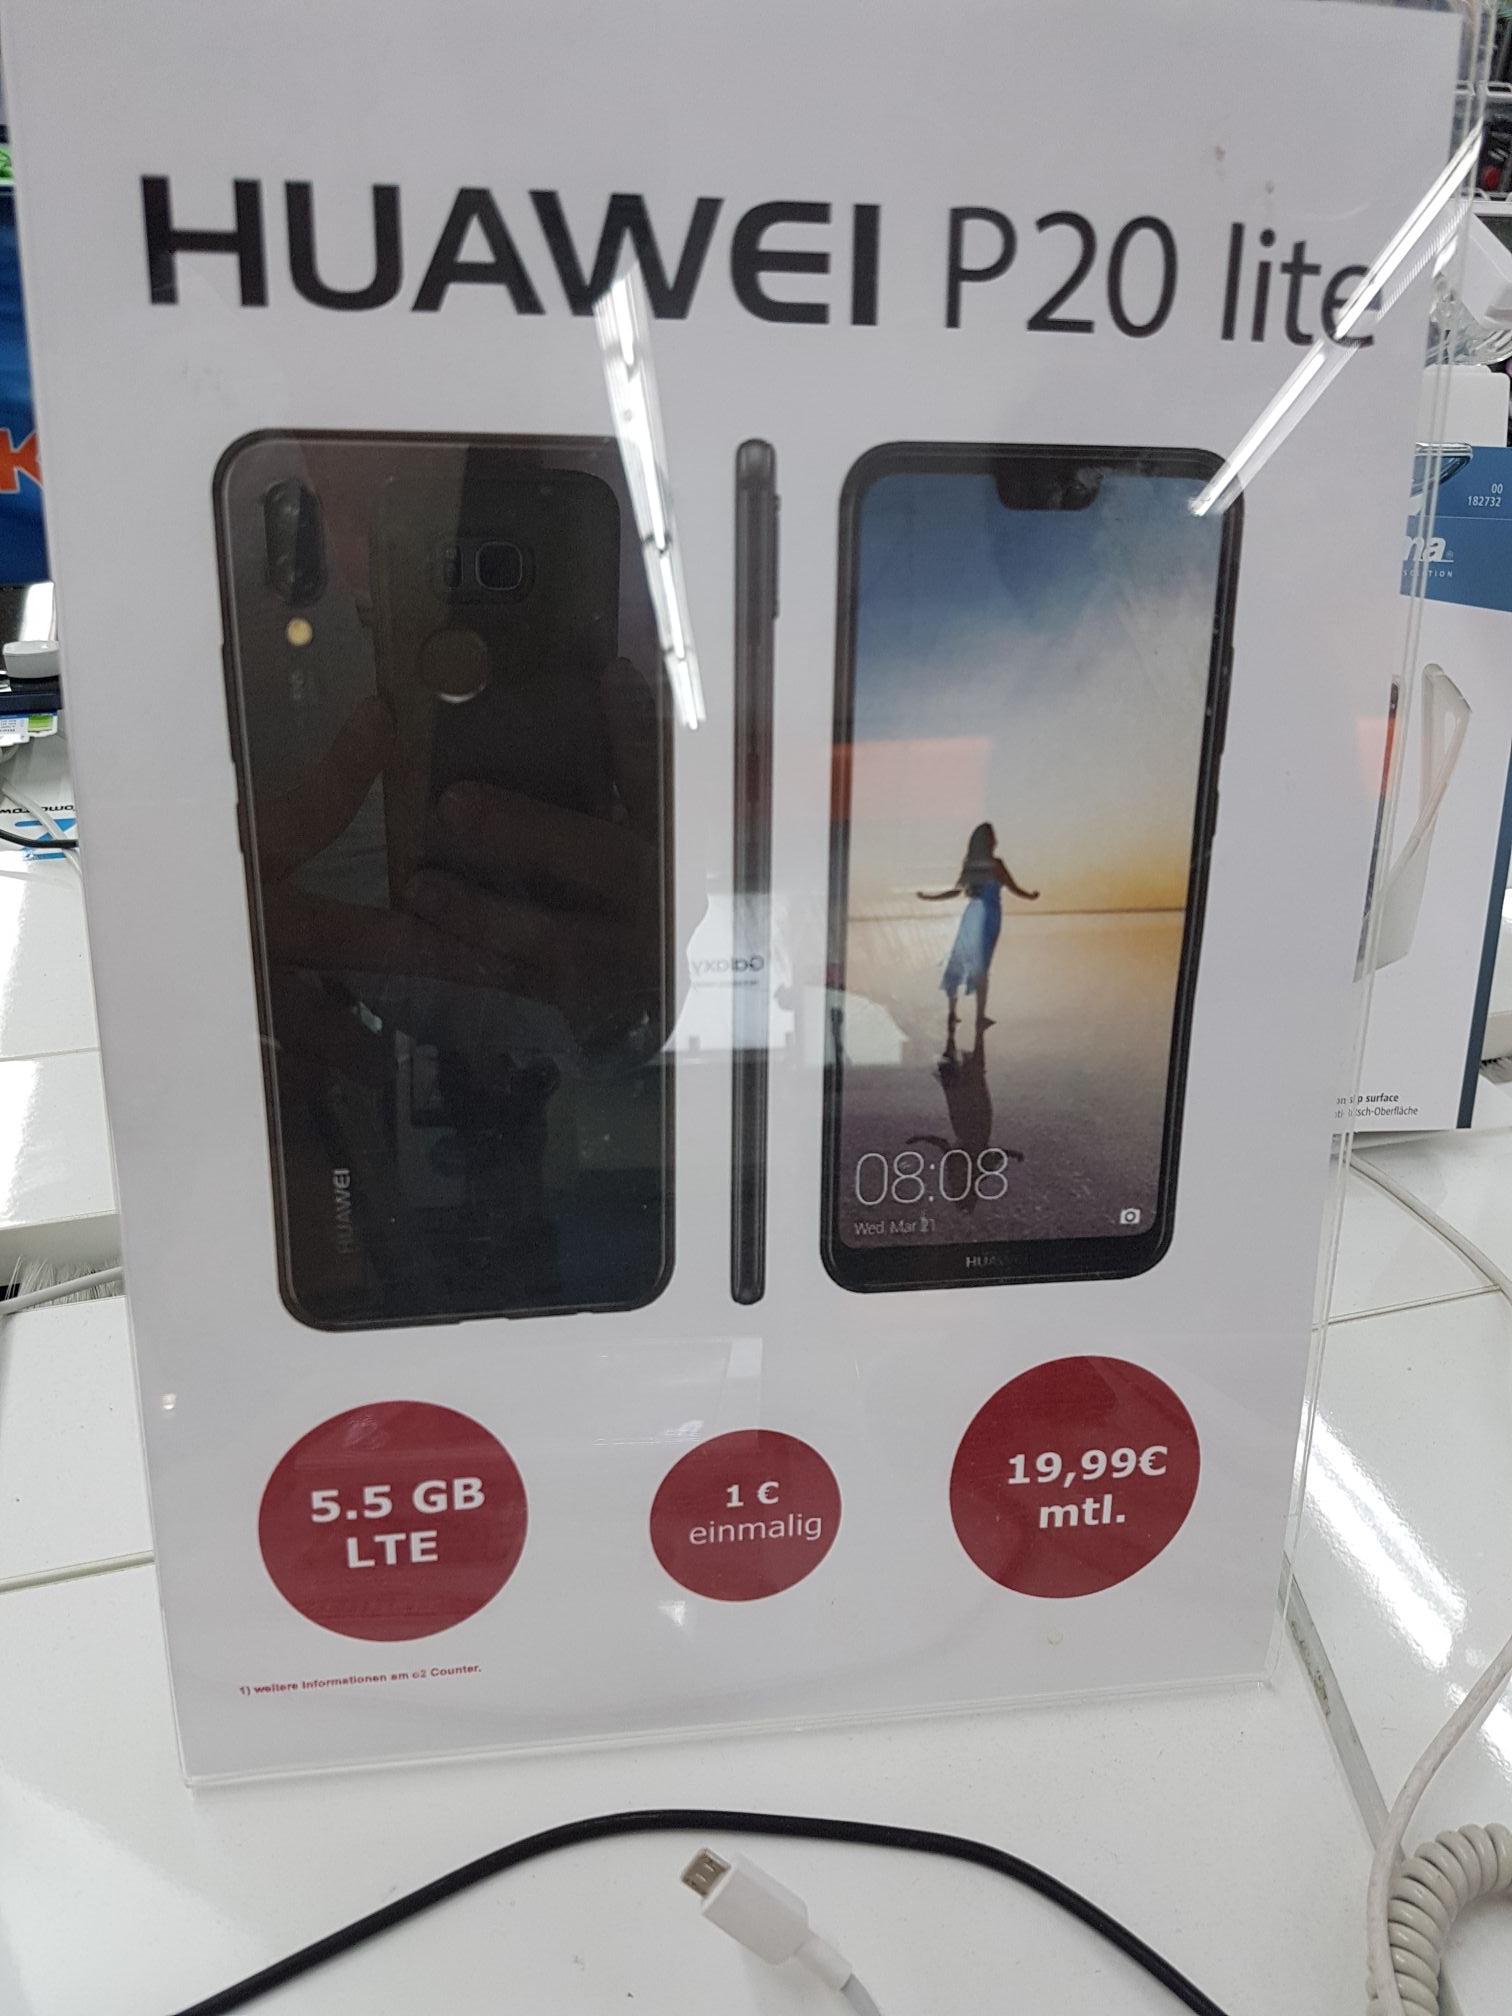 Huawei P20 Lite mit allnet flat 5.5gb lte LOKAL Saturn Remscheid